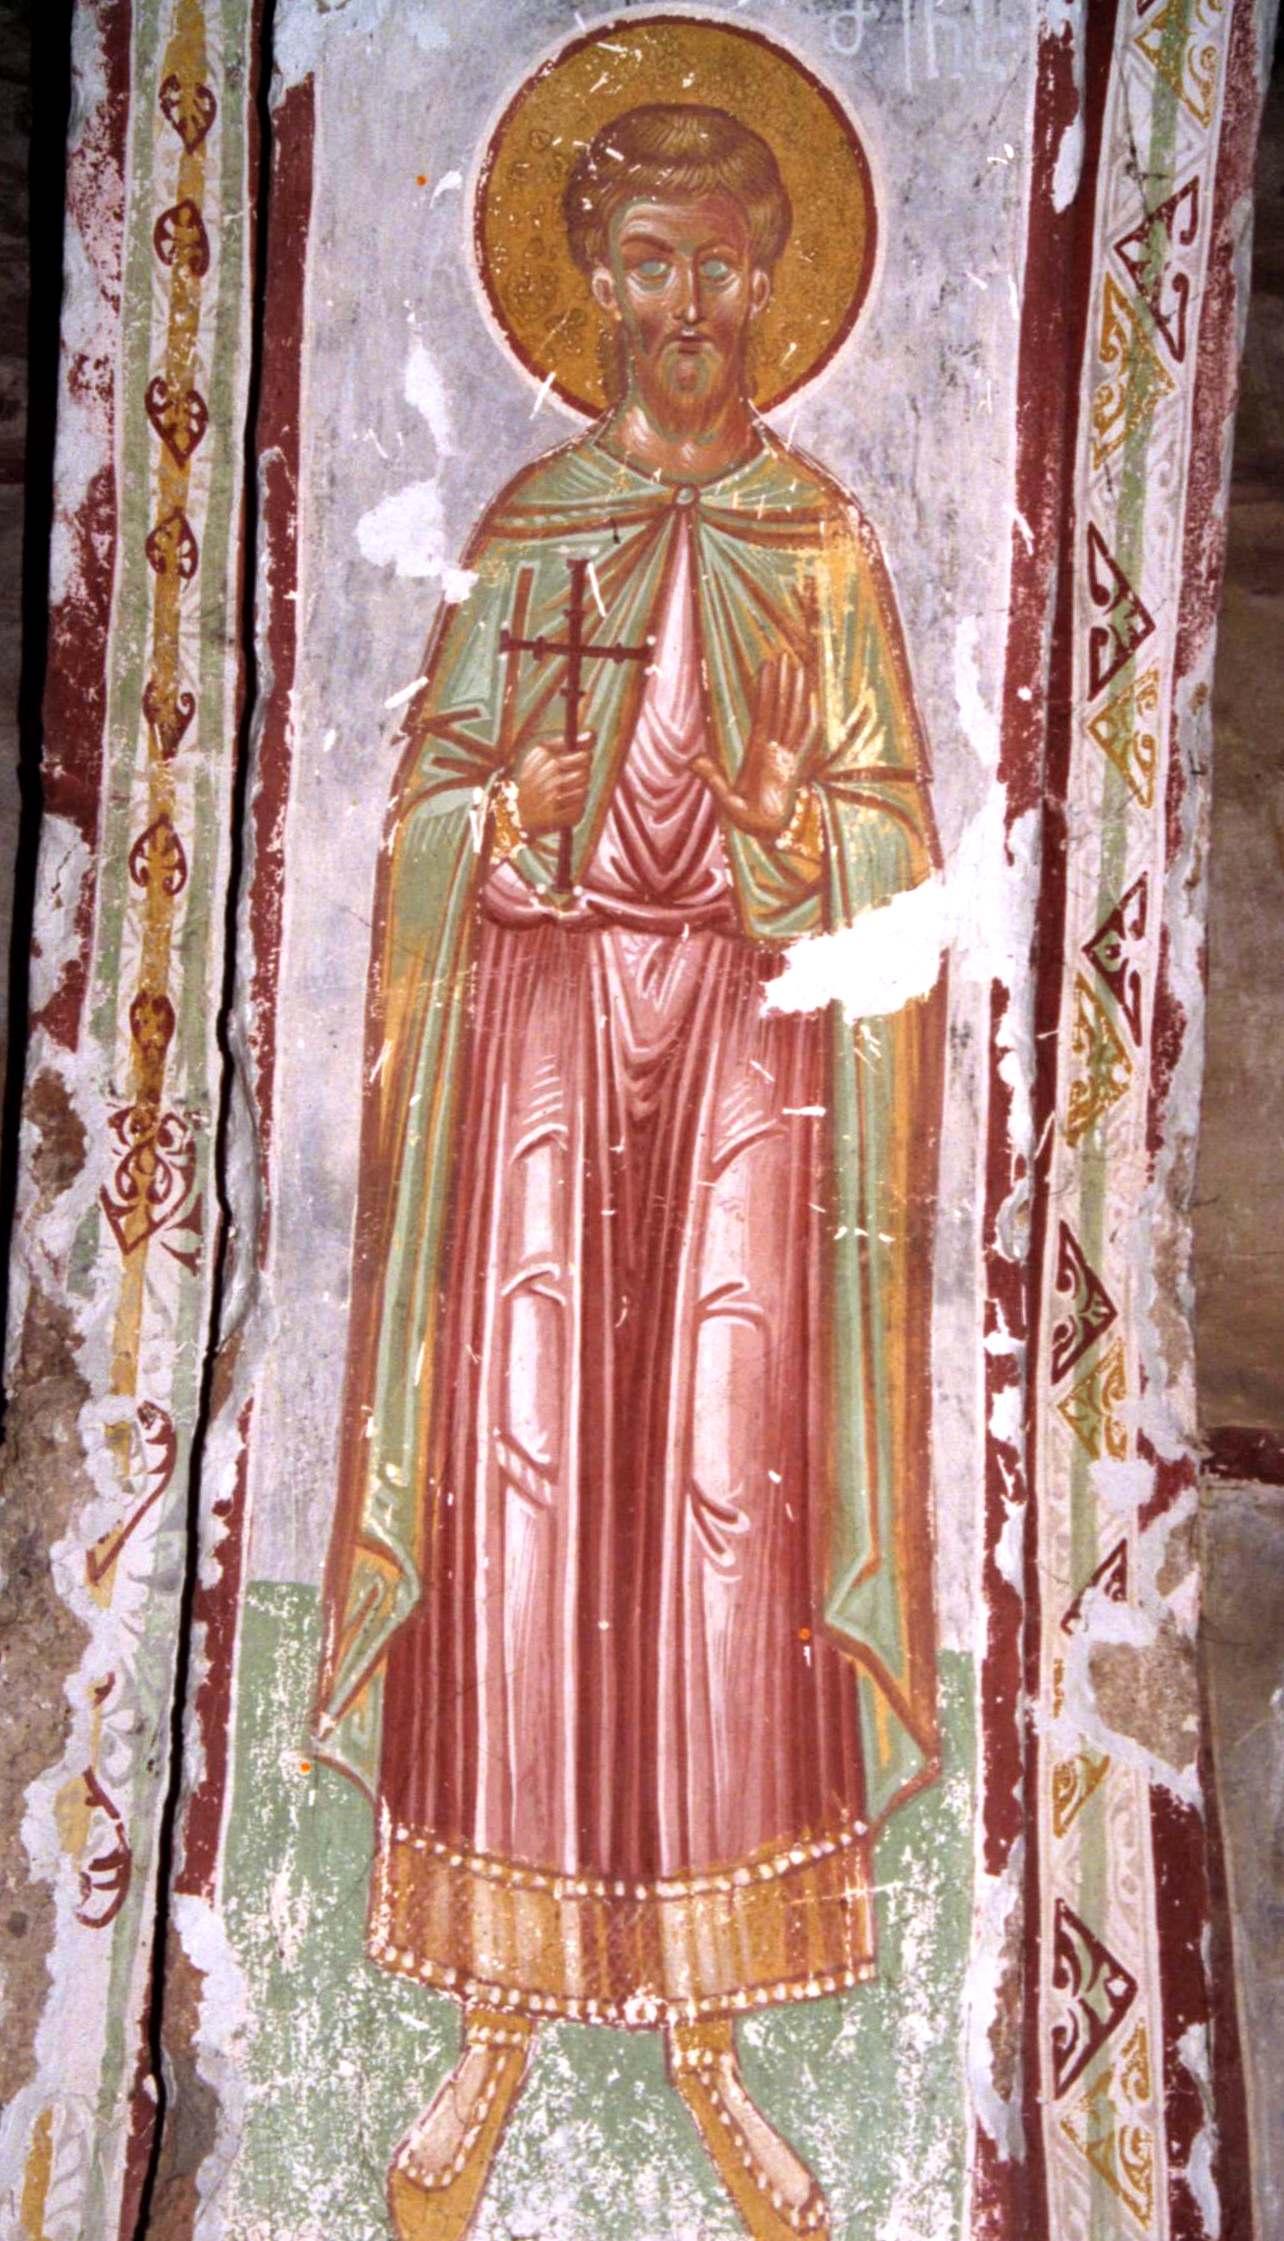 Святой Мина. Фреска собора Христа Спасителя в Цаленджихе, Грузия. XIV век.